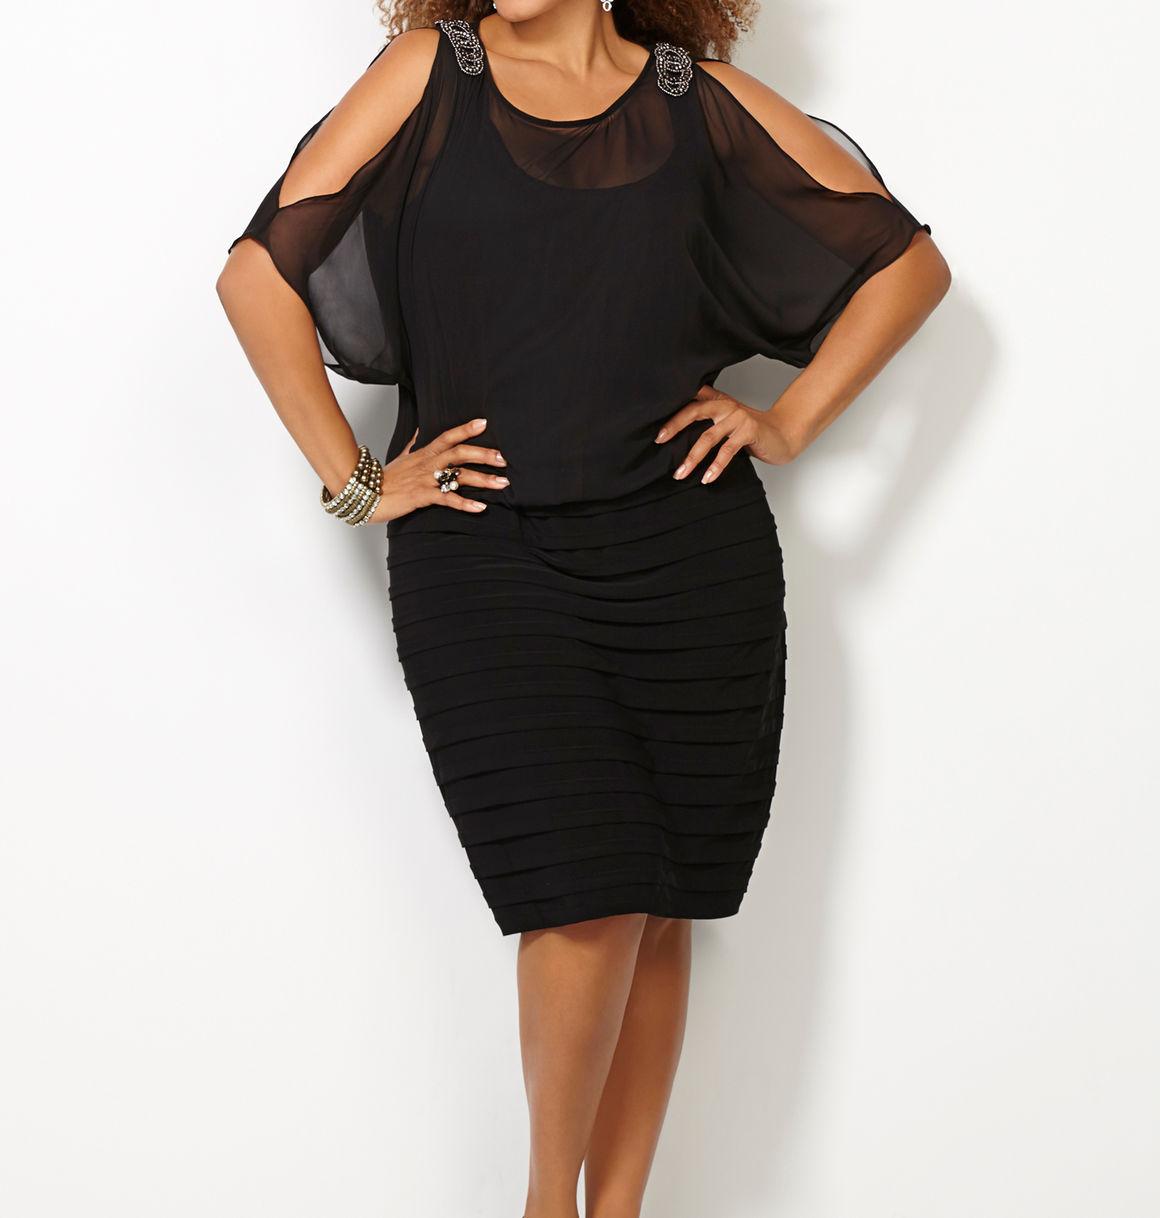 50 Trendy Plus Size New Years Eve Dresses 2020 - Plus Size Women Fashion